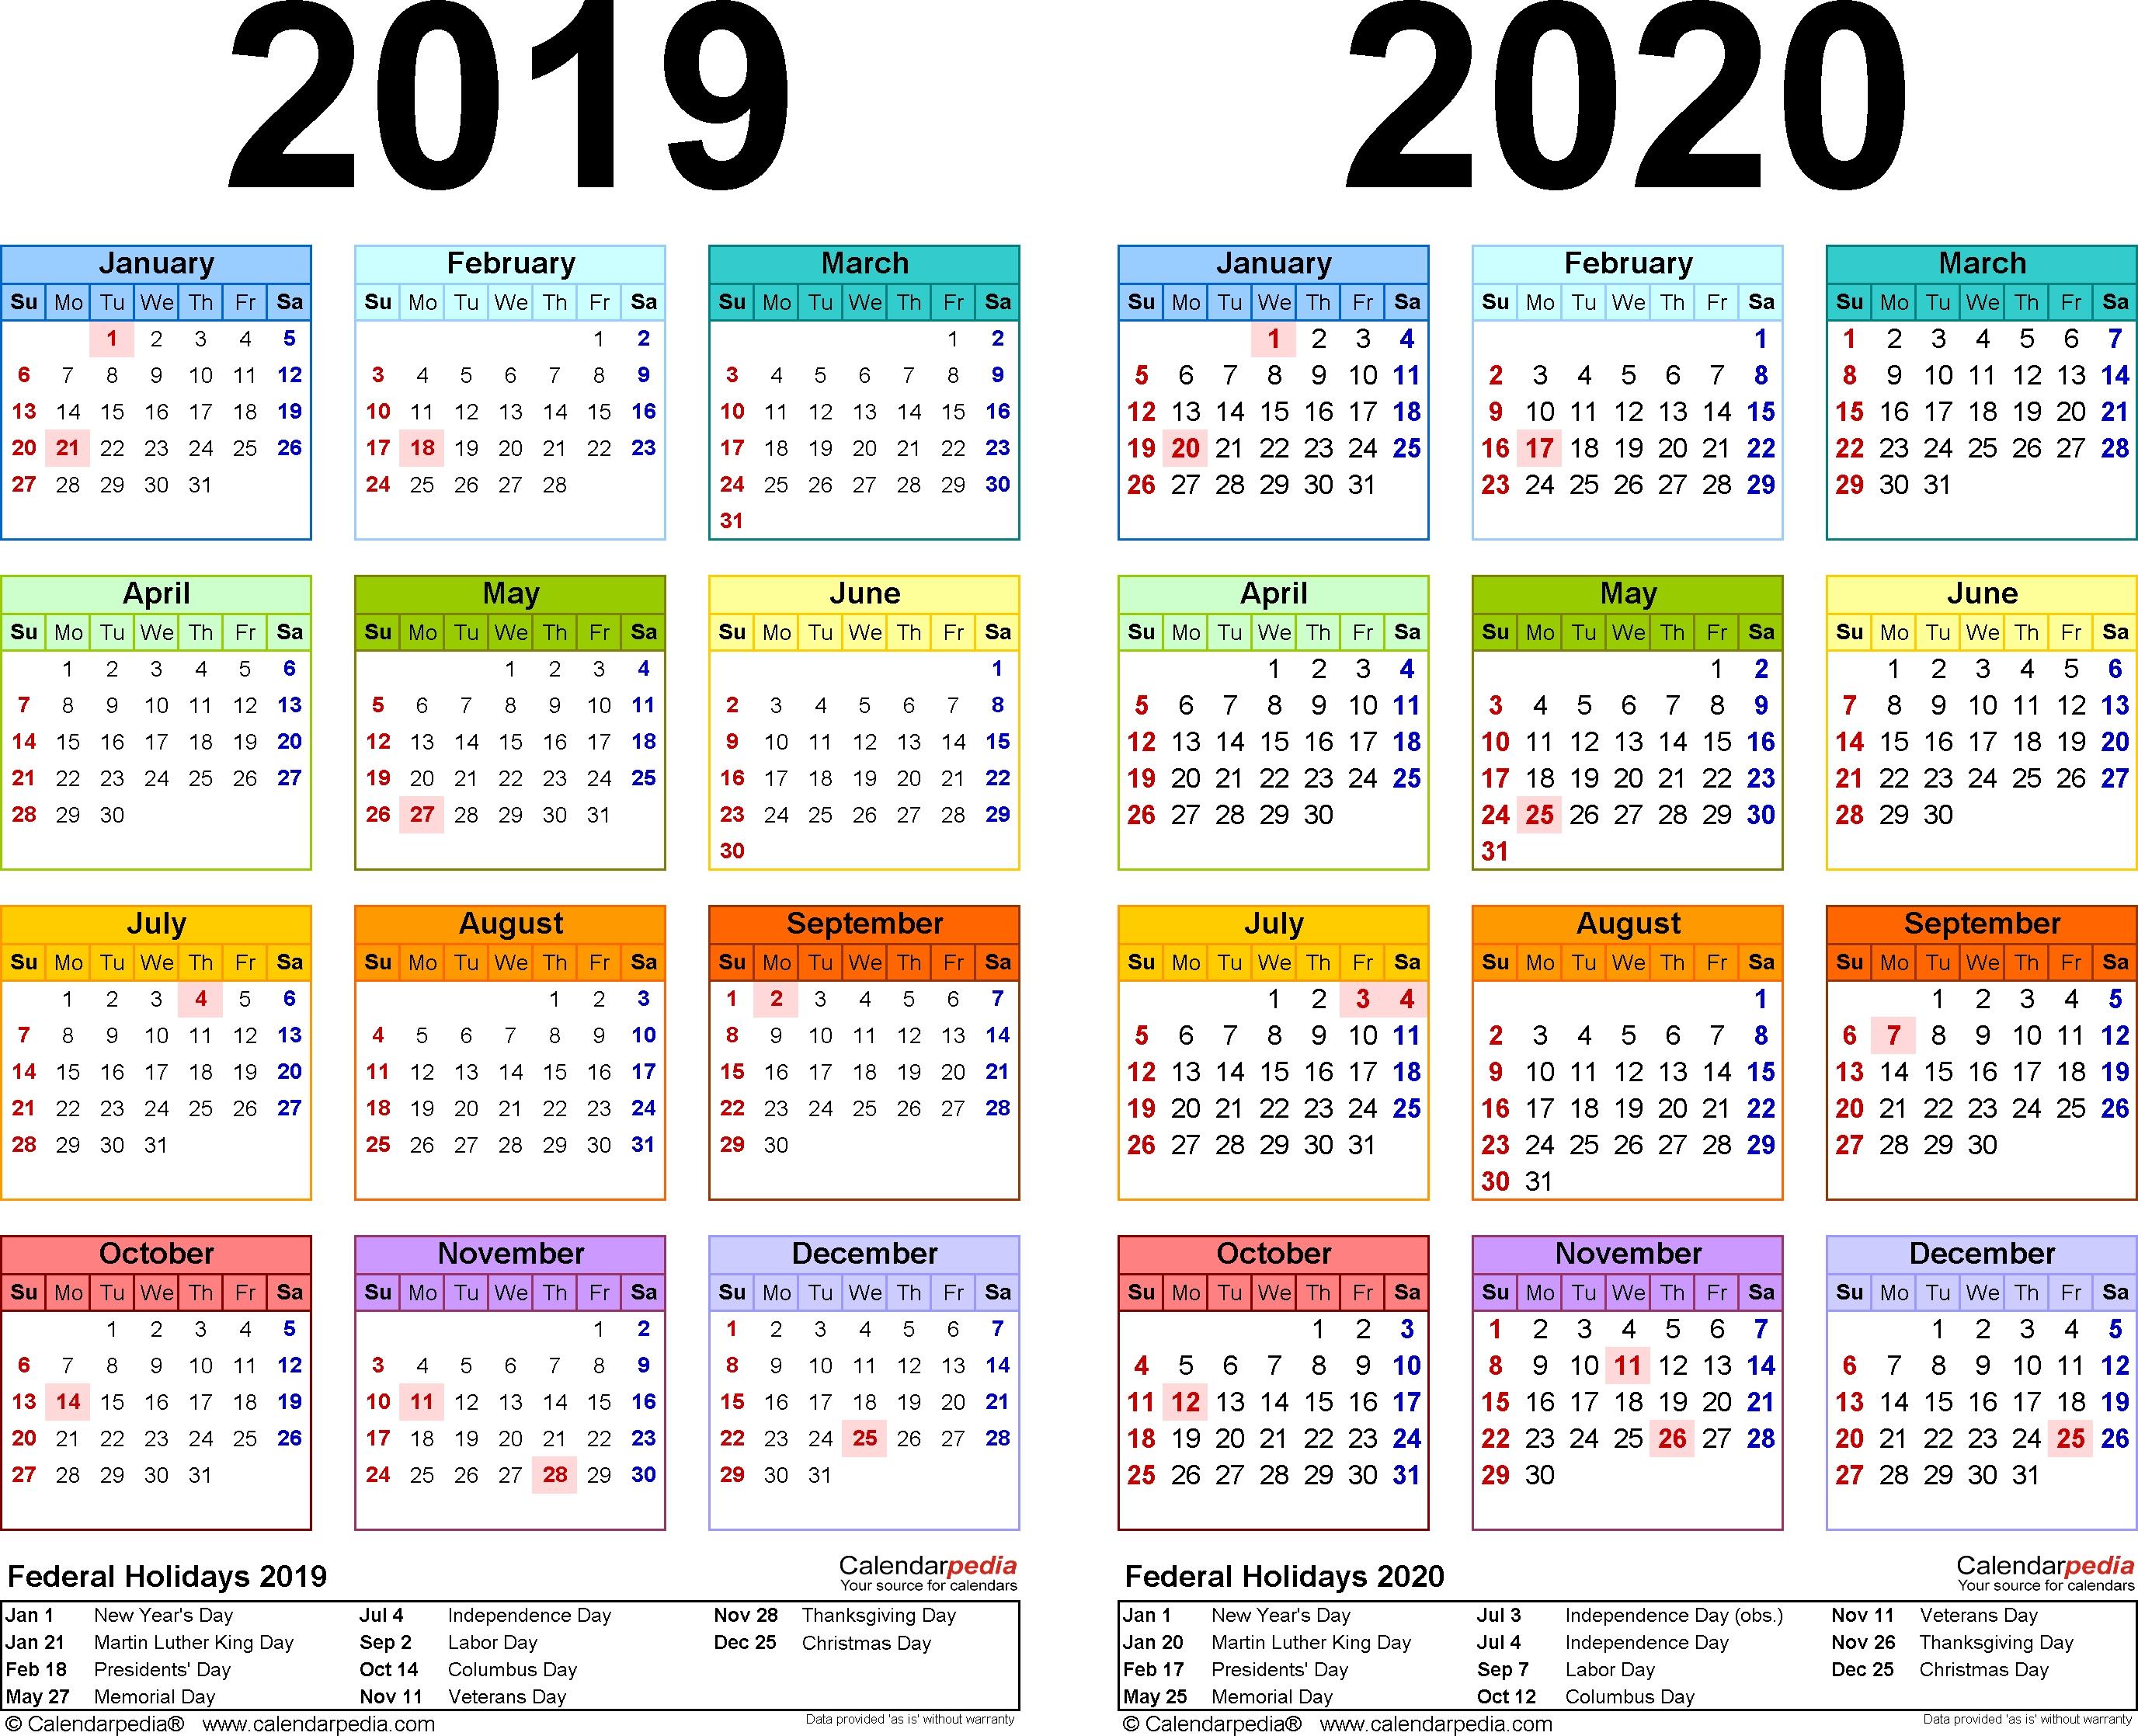 2019-2020 Calendar - Free Printable Two-Year Pdf Calendars pertaining to June 2019-June 2020 Yearly Calendar